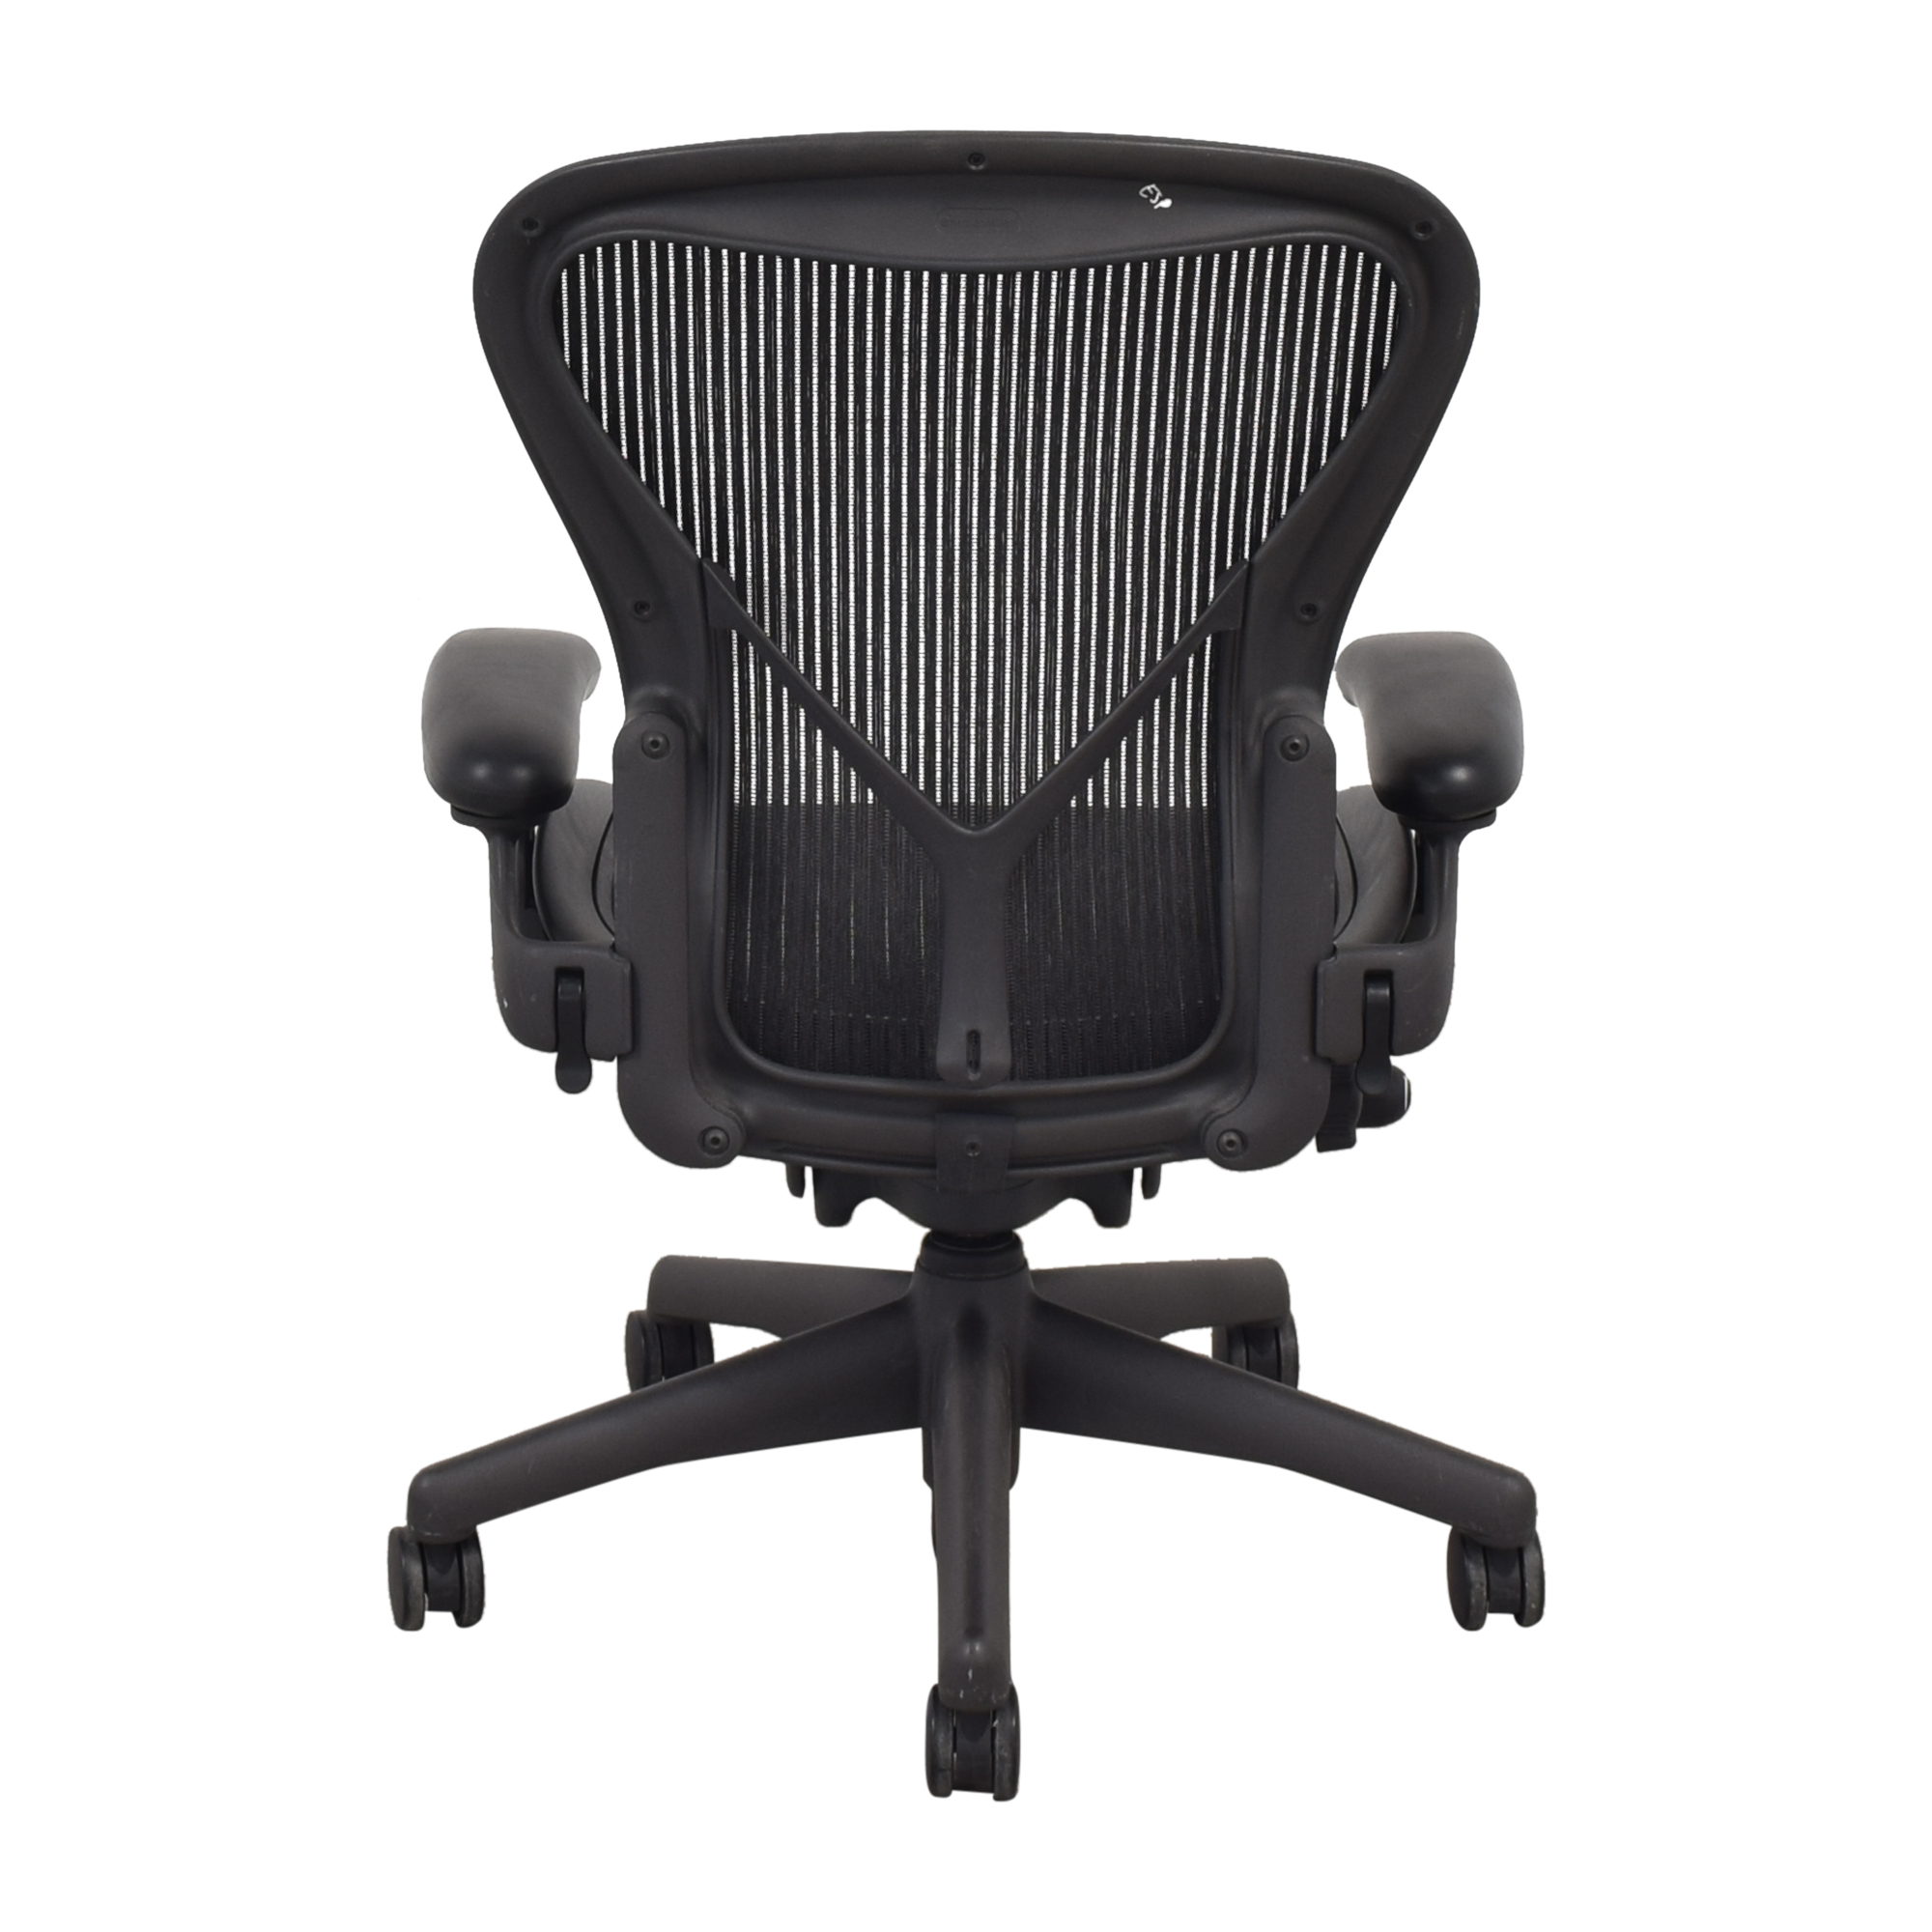 Herman Miller Herman Miller Size B Aeron Chair Home Office Chairs